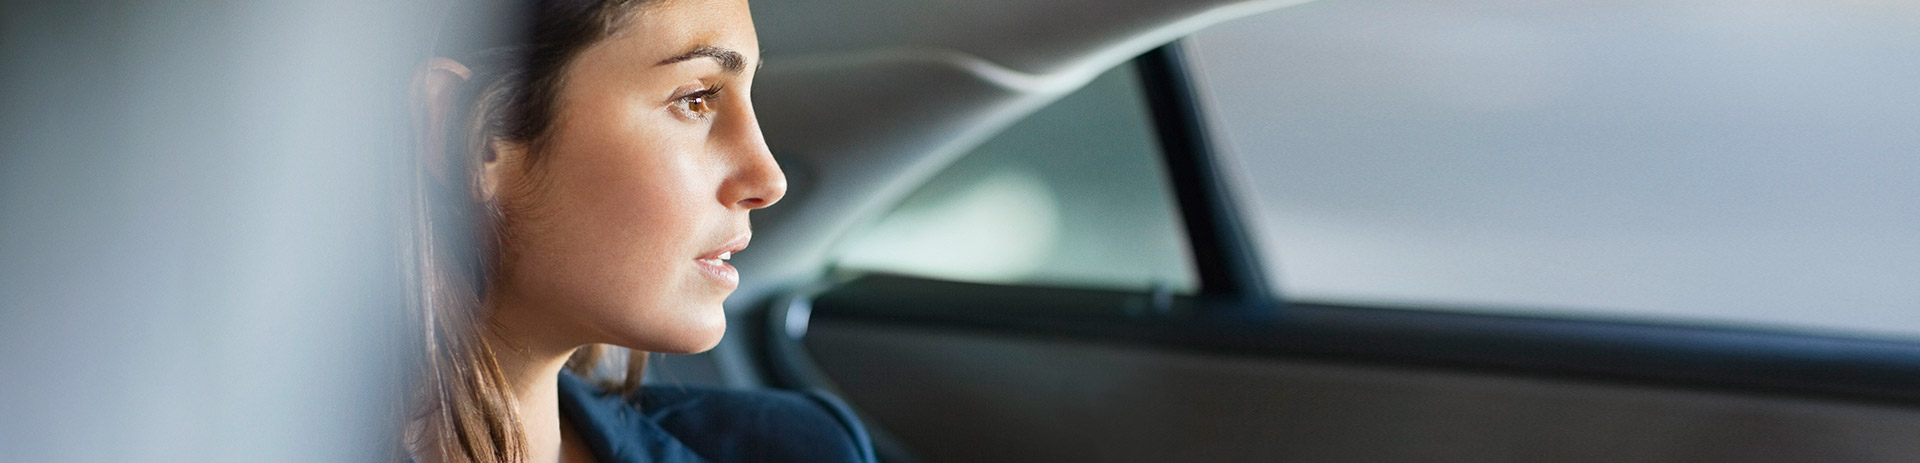 dunkelhaarige Frau in einem Auto